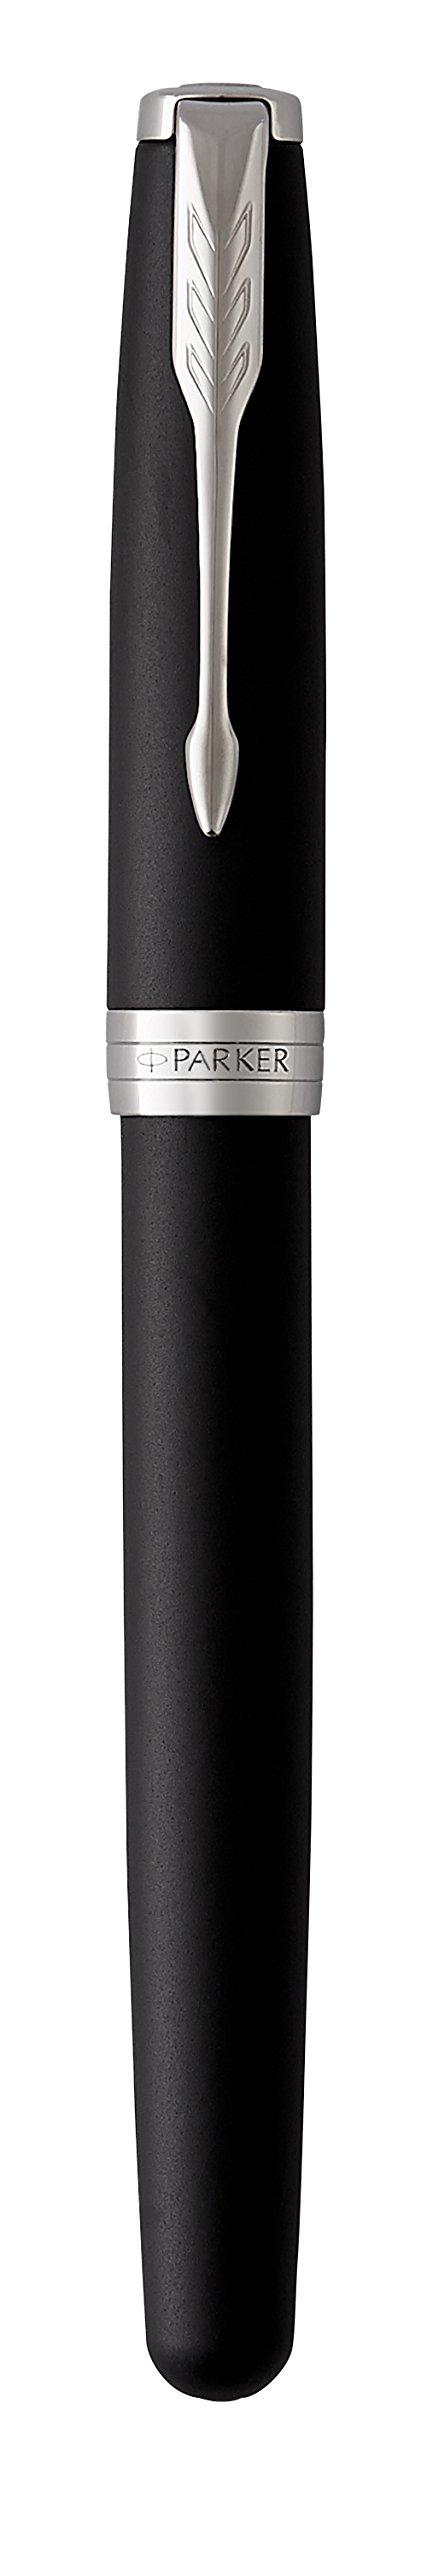 PARKER Sonnet Rollerball Pen, Matte Black Lacquer with Palladium Trim, Fine Point Black Ink (1931523) by Parker (Image #6)